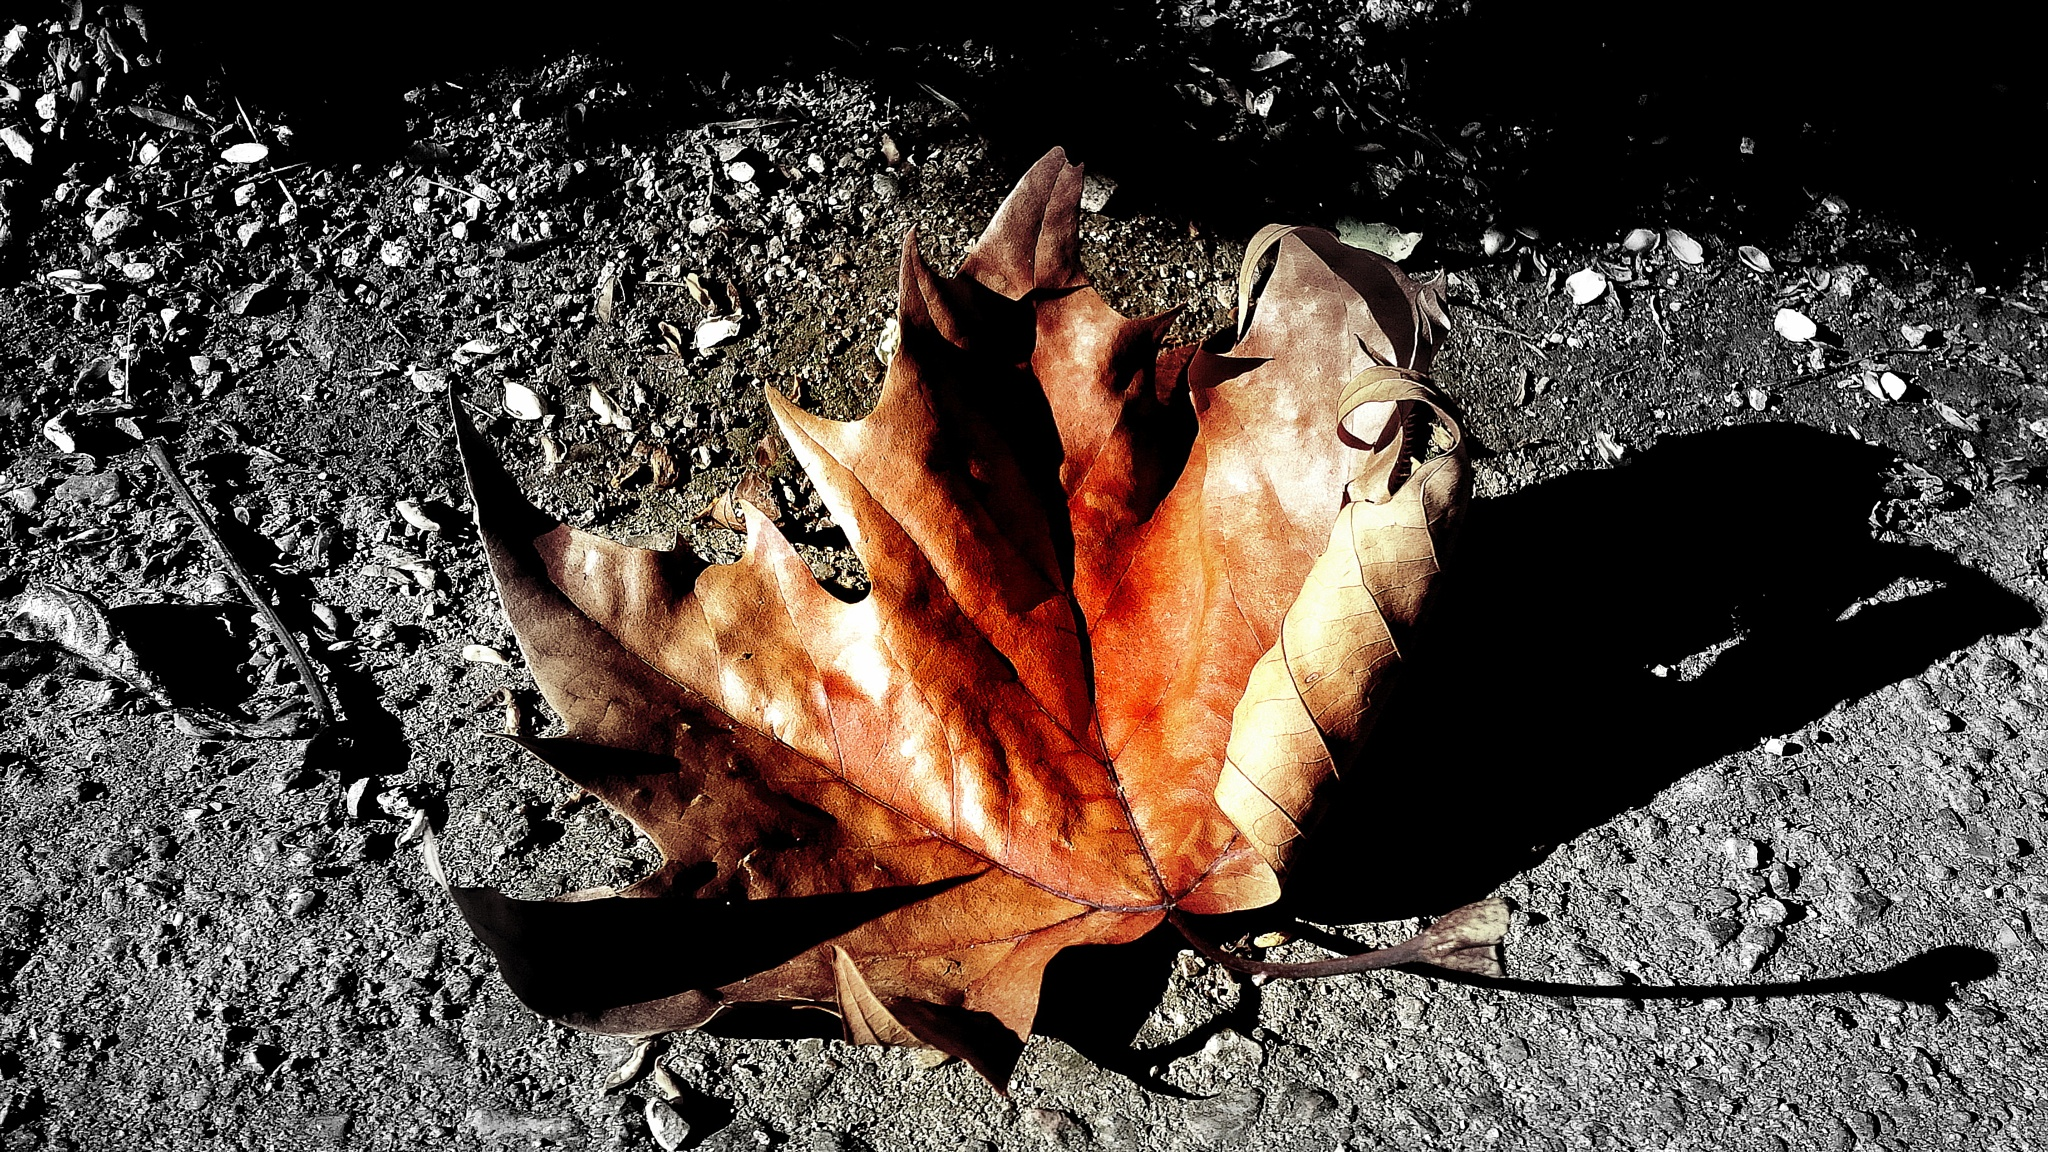 Autumn Leaf by Rudy Tarrazona Guacena